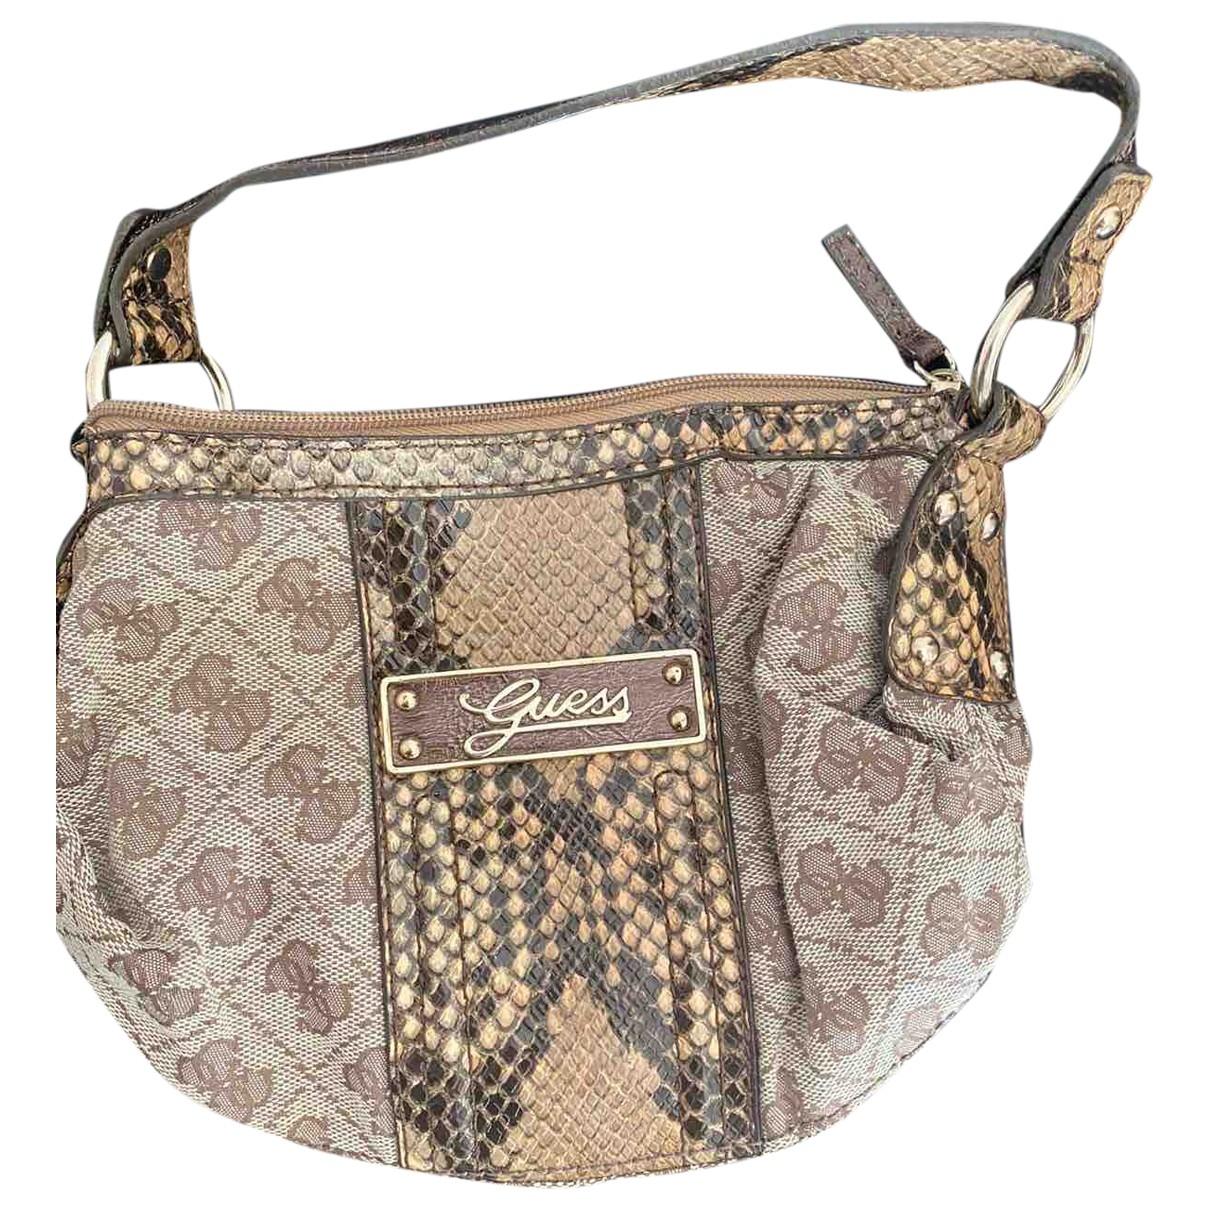 Guess \N Gold Cotton Clutch bag for Women \N